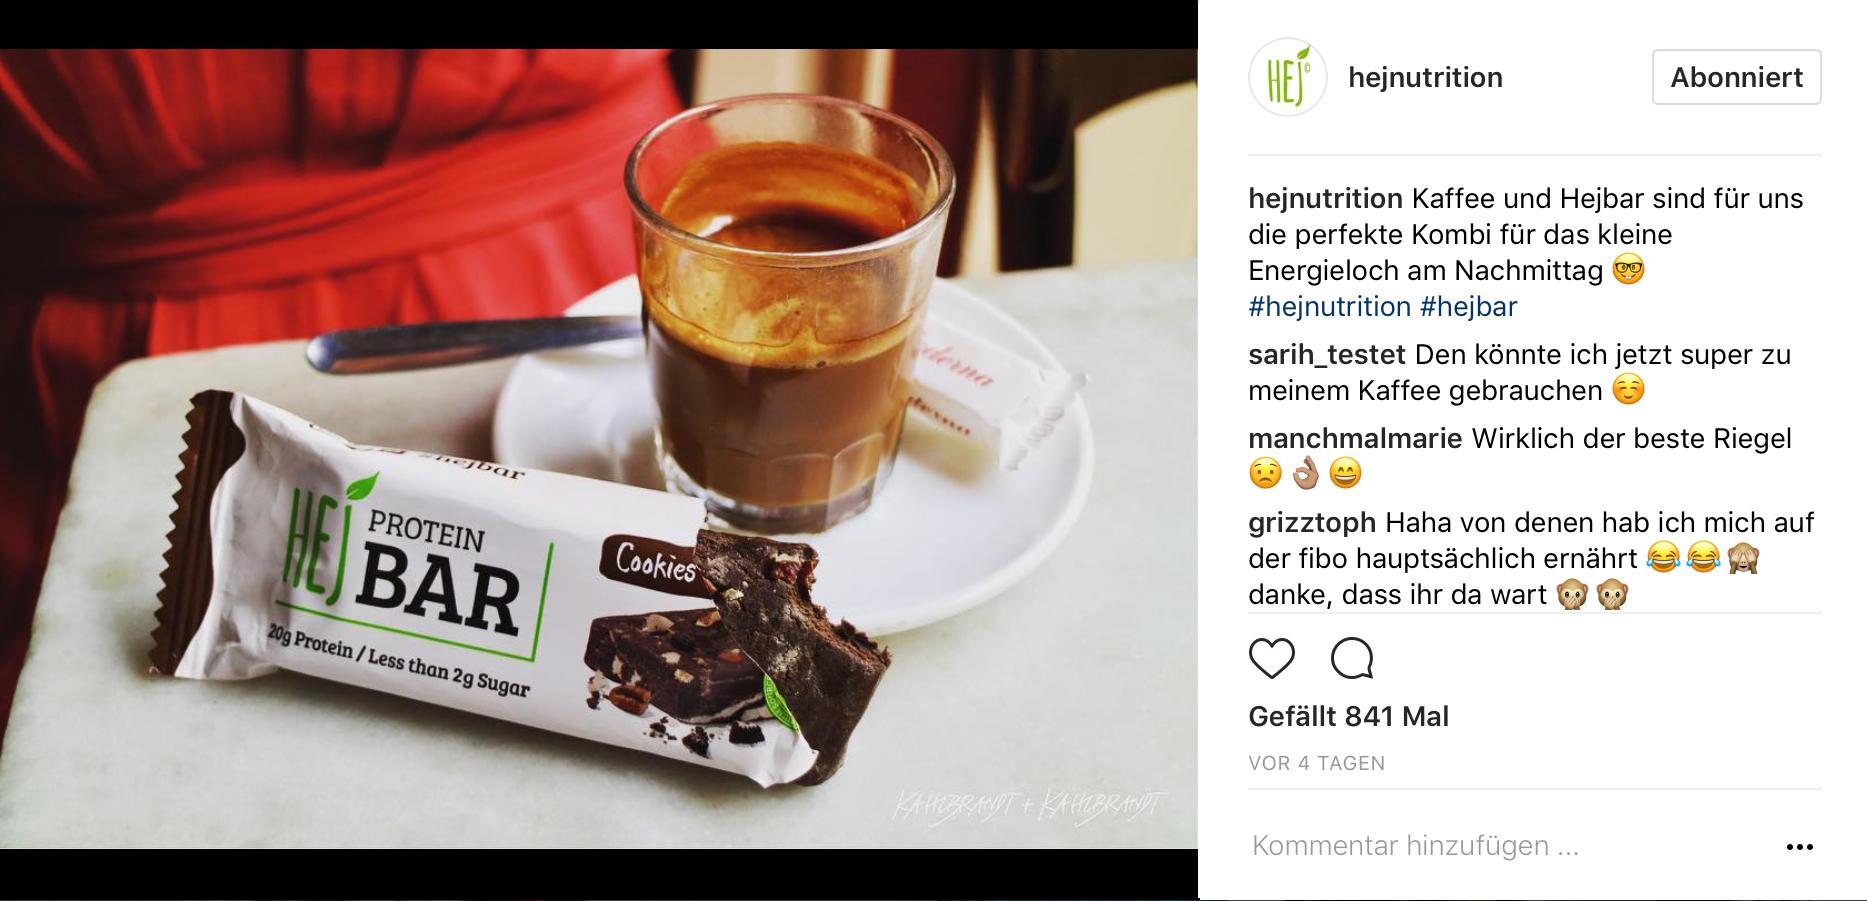 hej_nutrition_instagram_09.06.2017+.jpg